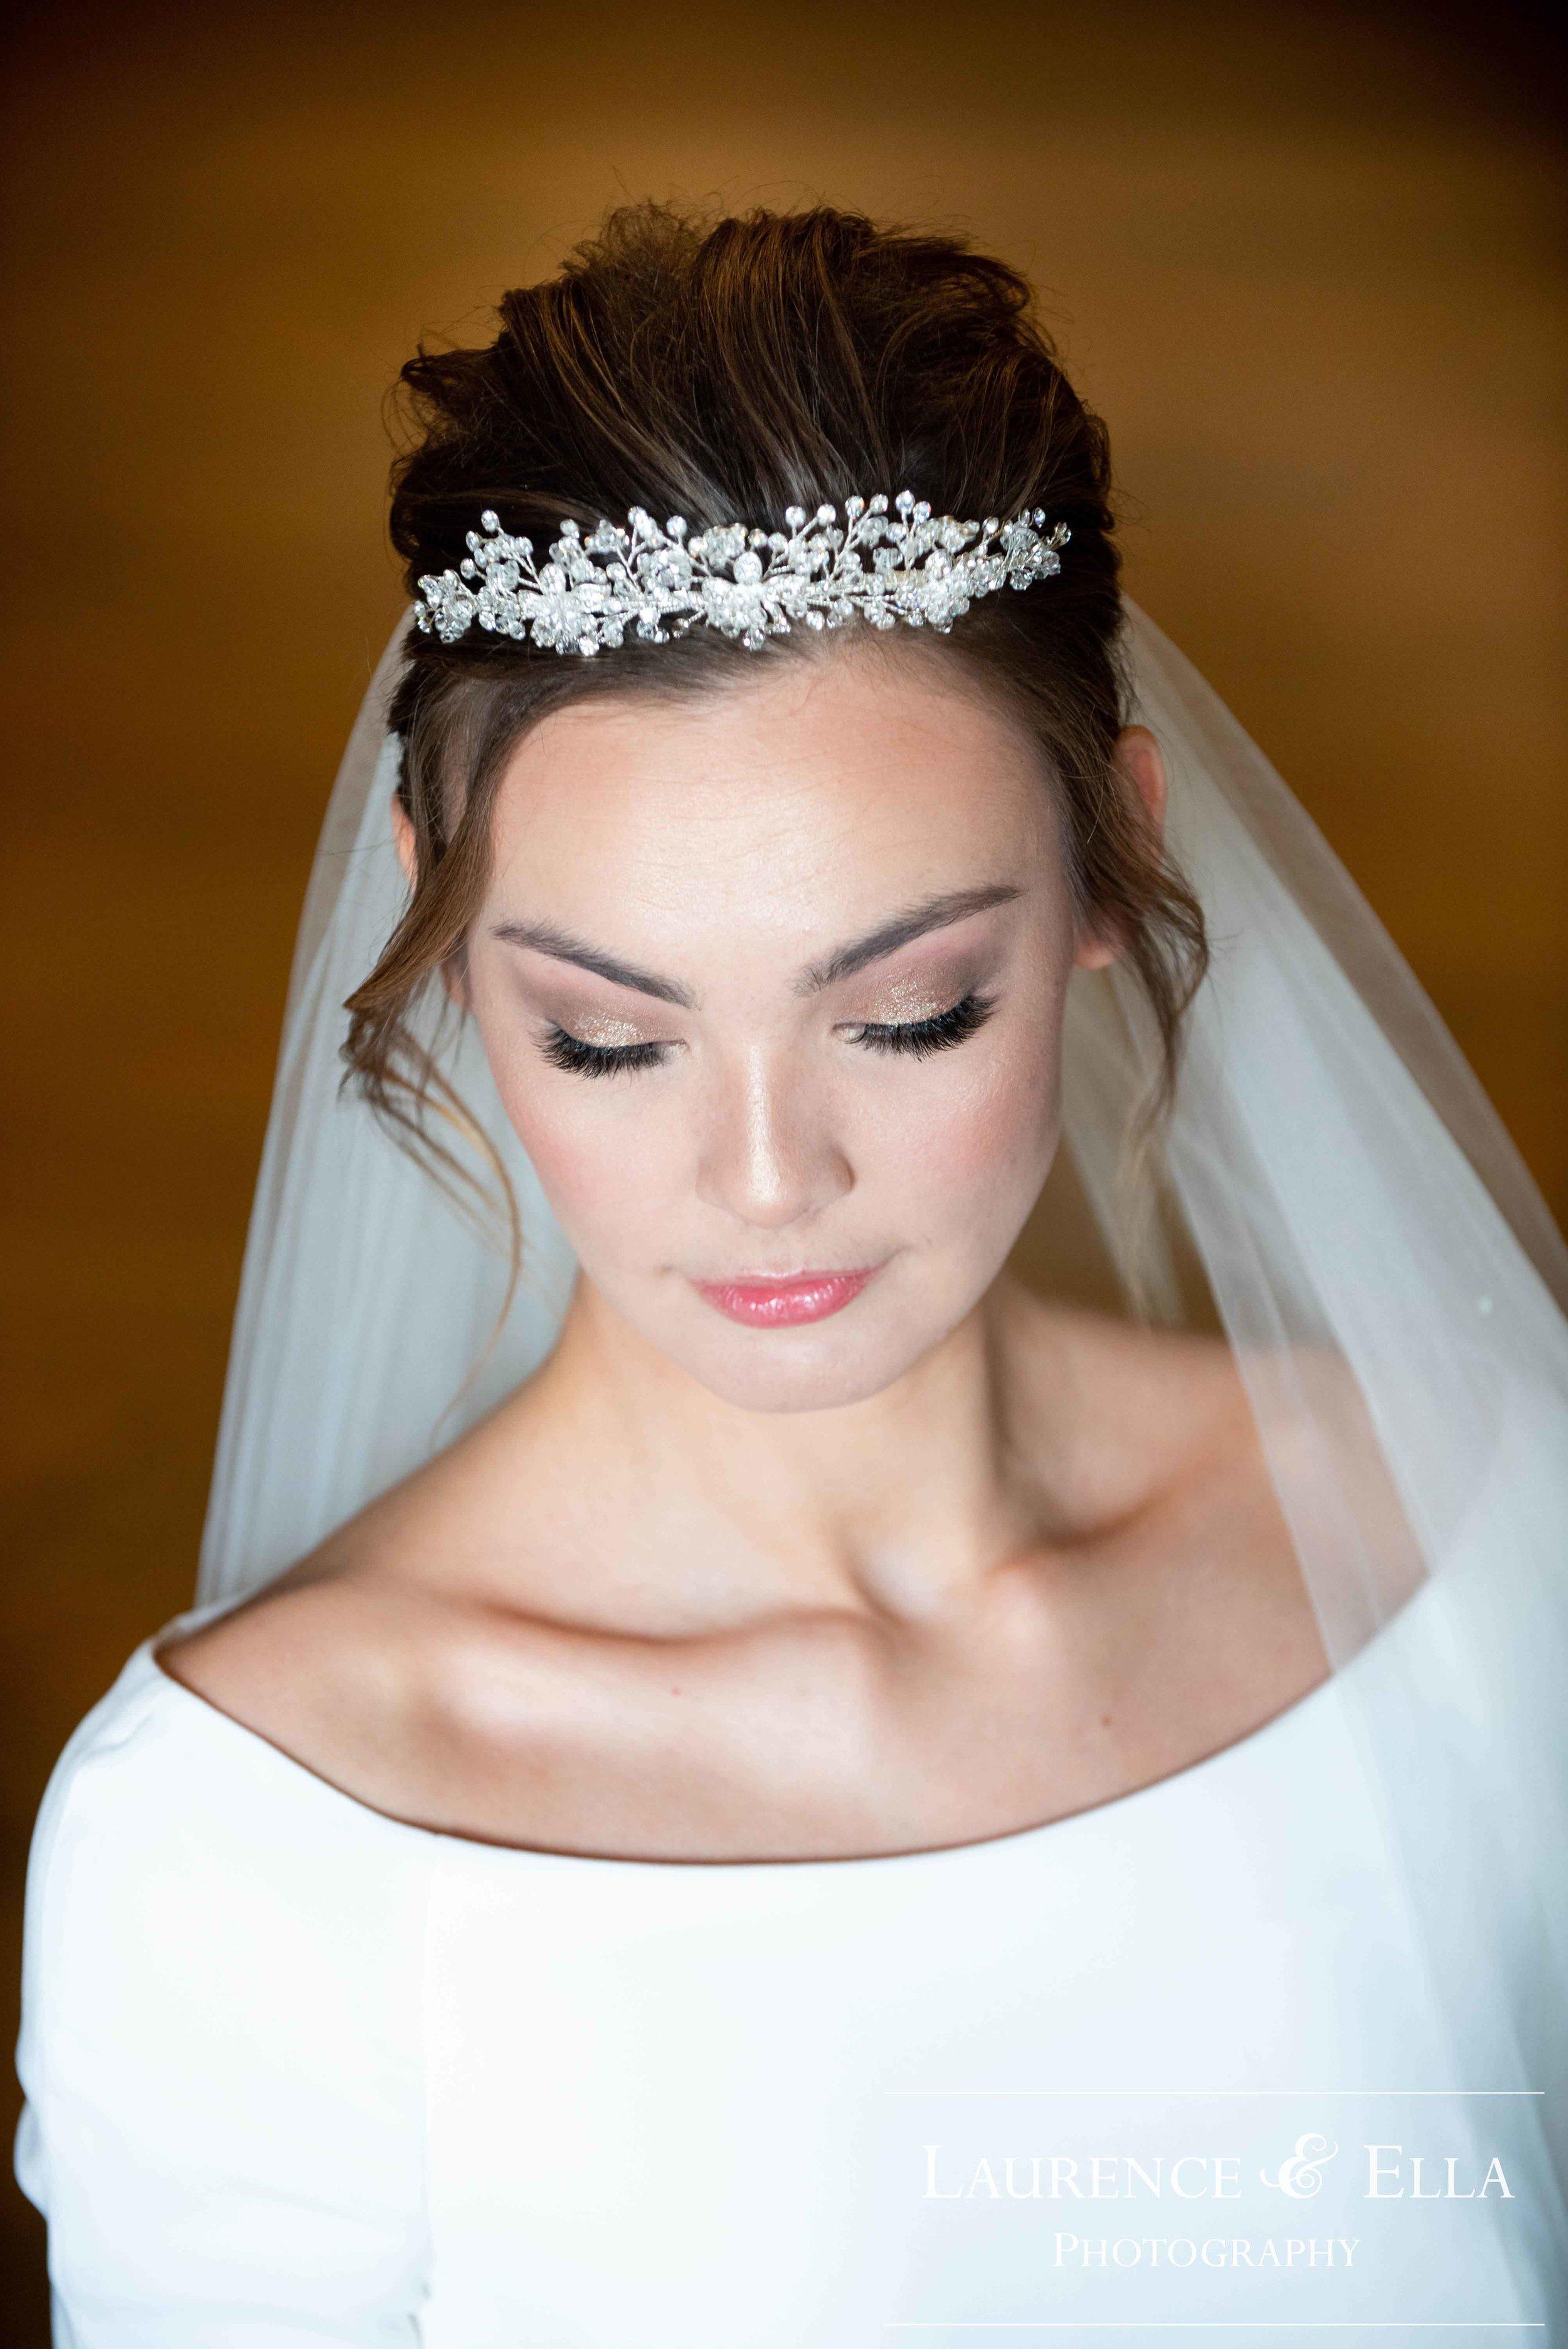 Opaline princess tiara - Laurence & Ella Photography